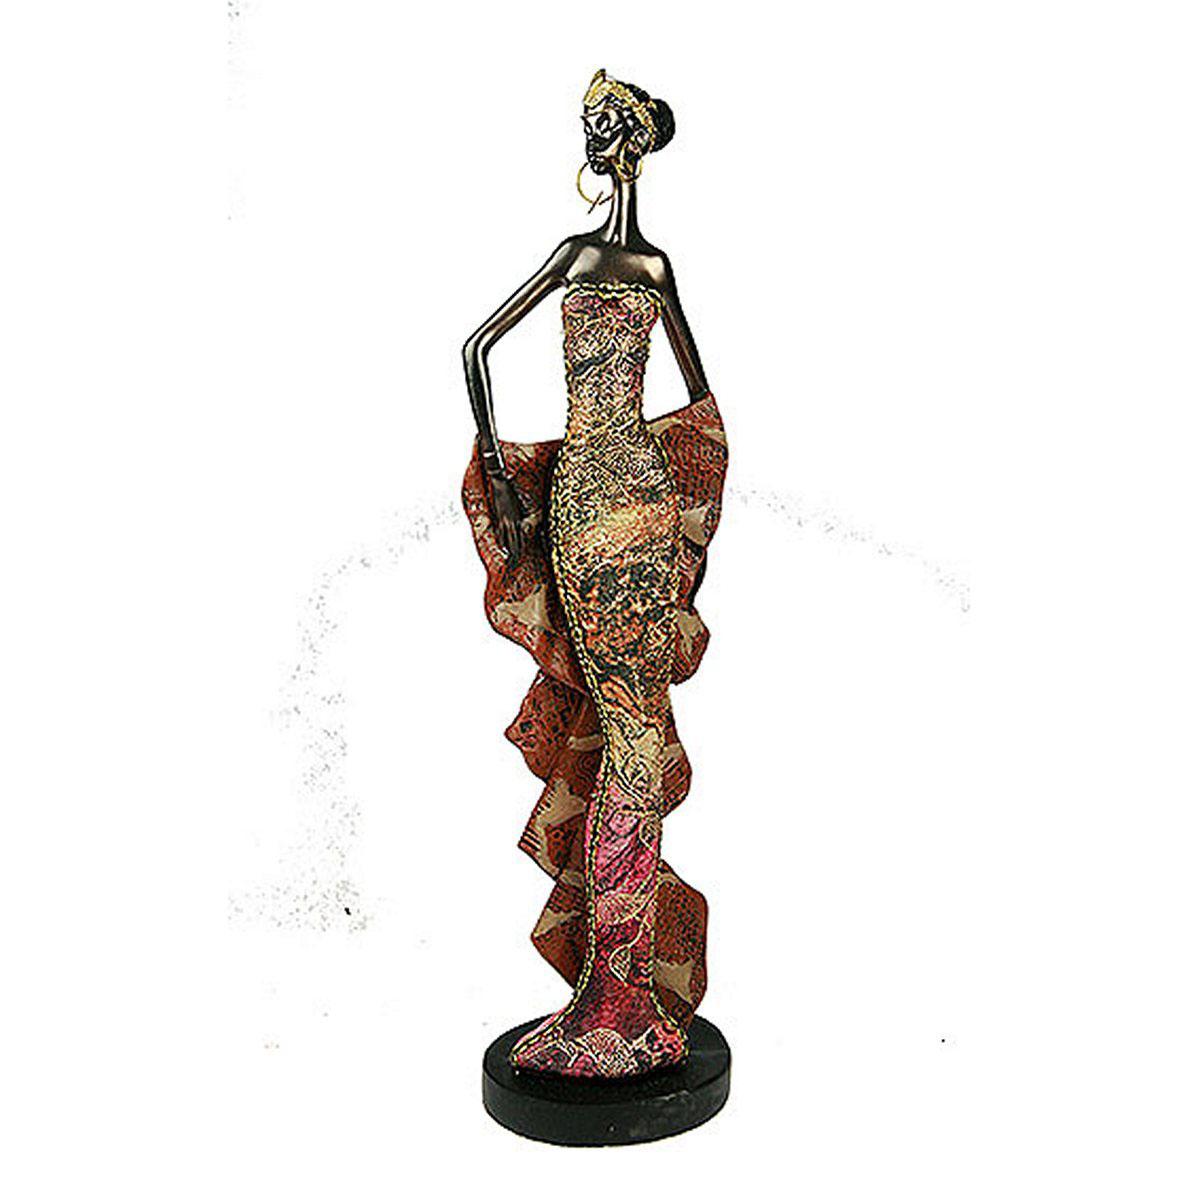 Статуэтка Русские Подарки Африканка, 7 х 9 х 33 см статуэтка lefard африканка 174 311